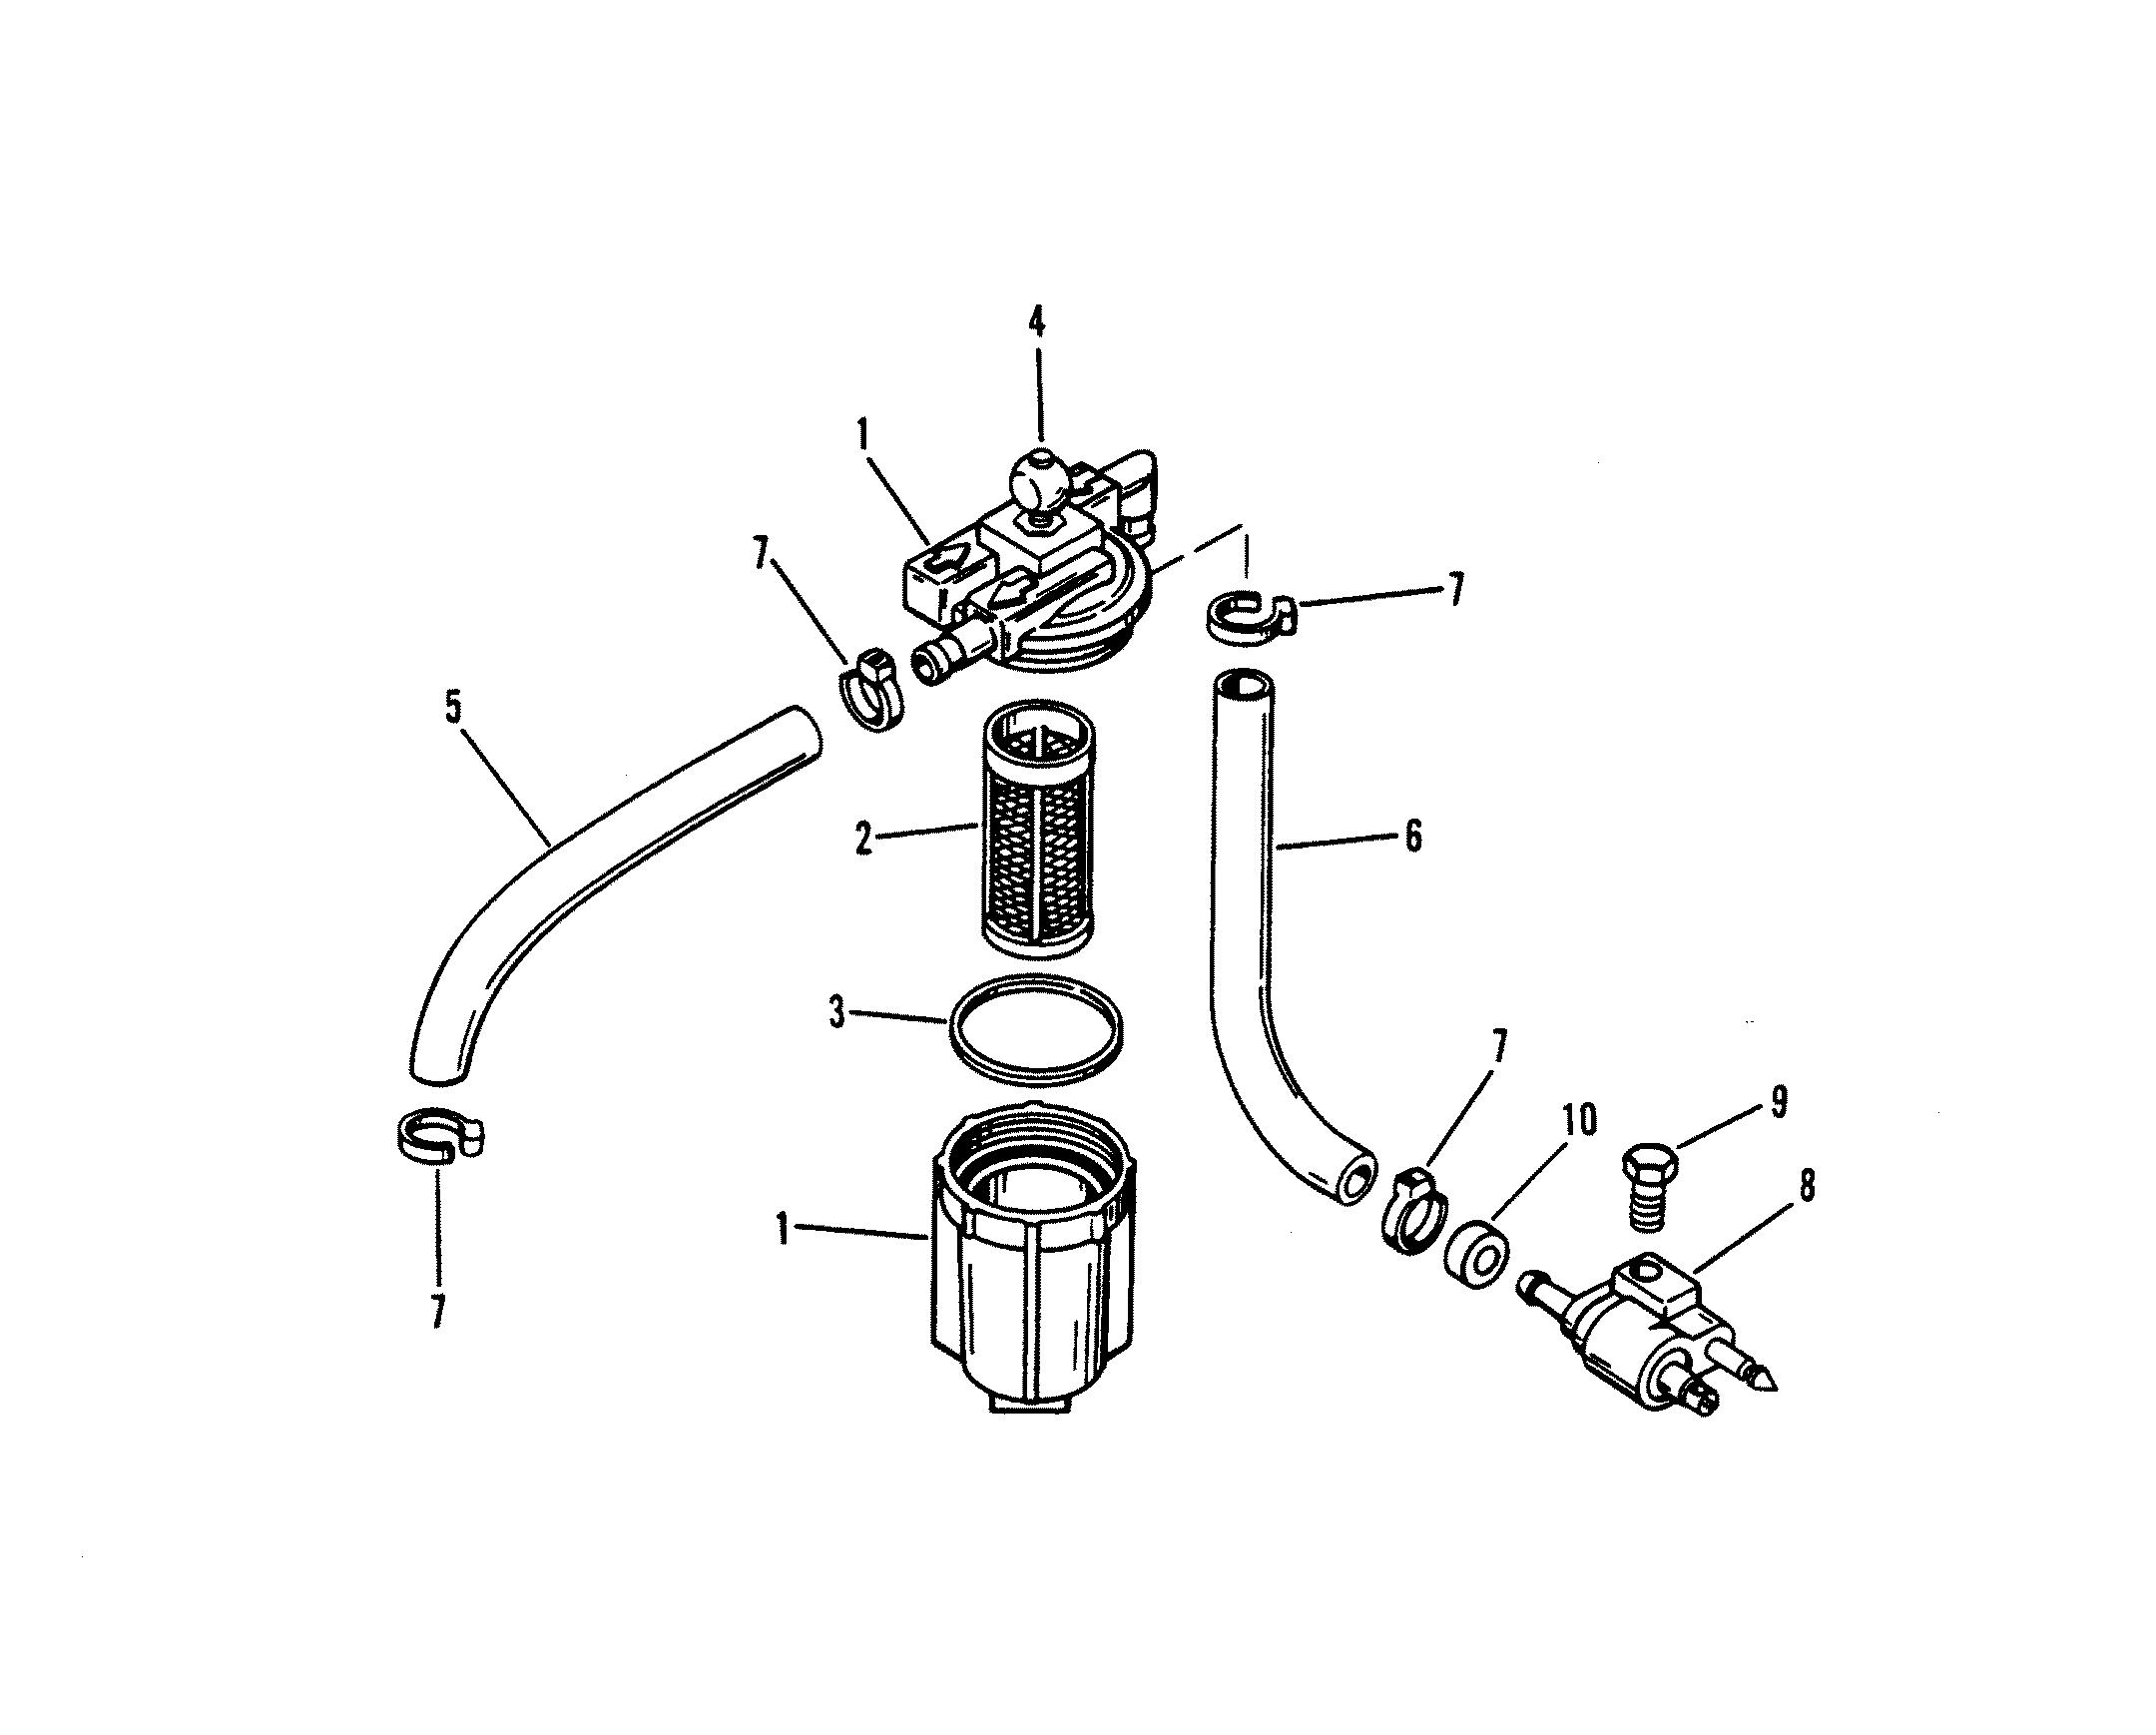 Mercury Mercury 6 0a Thru 0d Fuel Filter Assembly